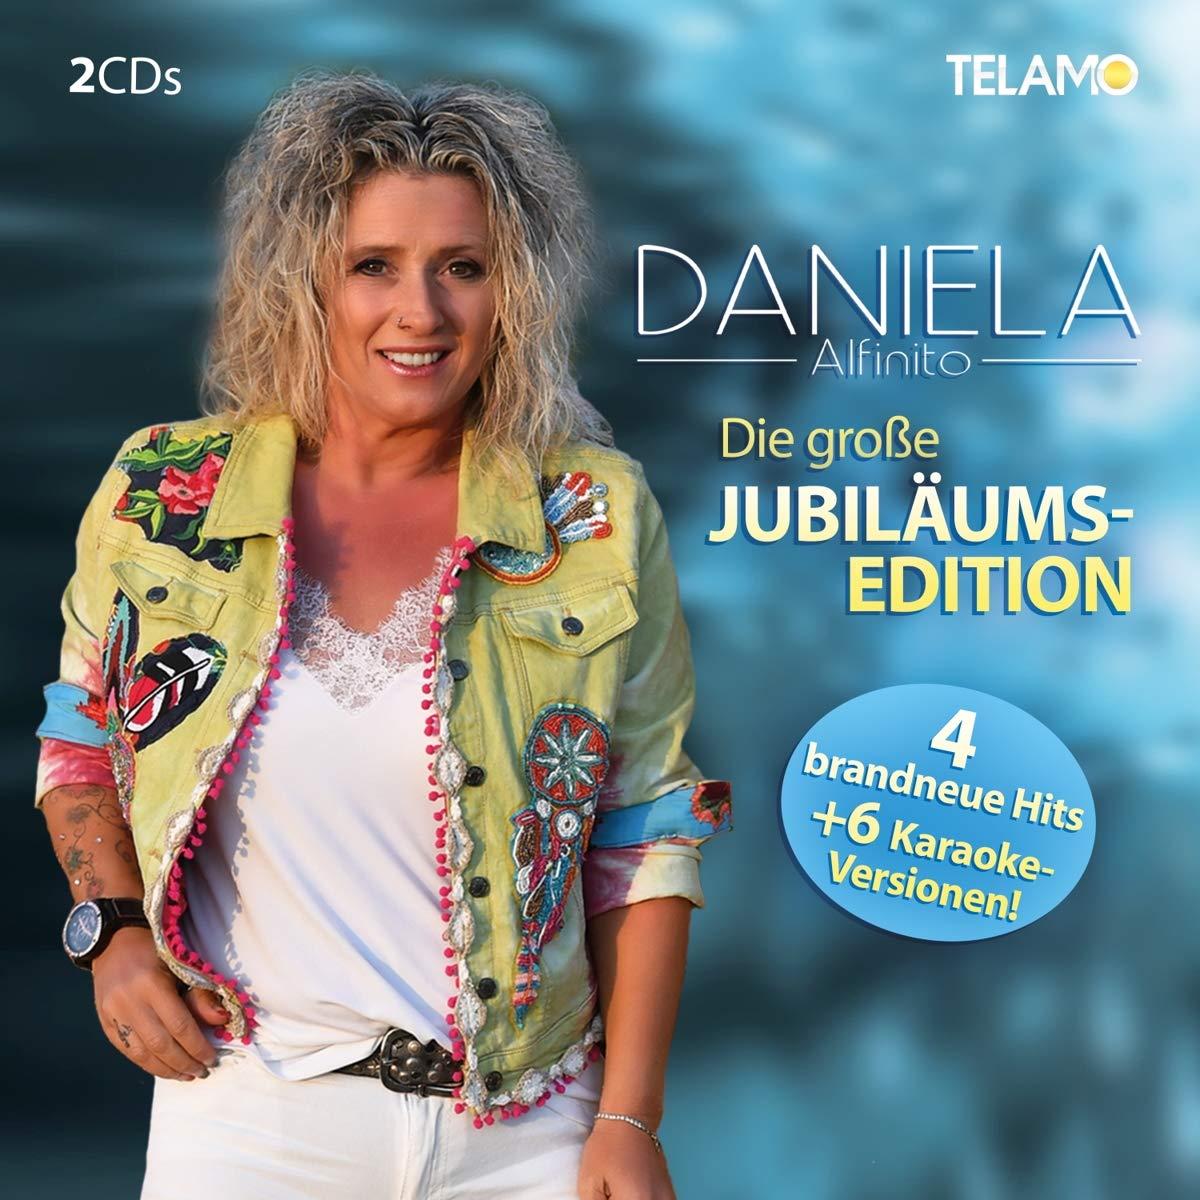 DANIELA ALFINITO * Die große Jubiläums-Edition (Doppel-CD) *** exklusiv via Shop24Direct auch als 4-CD Box-Set erhältlich!